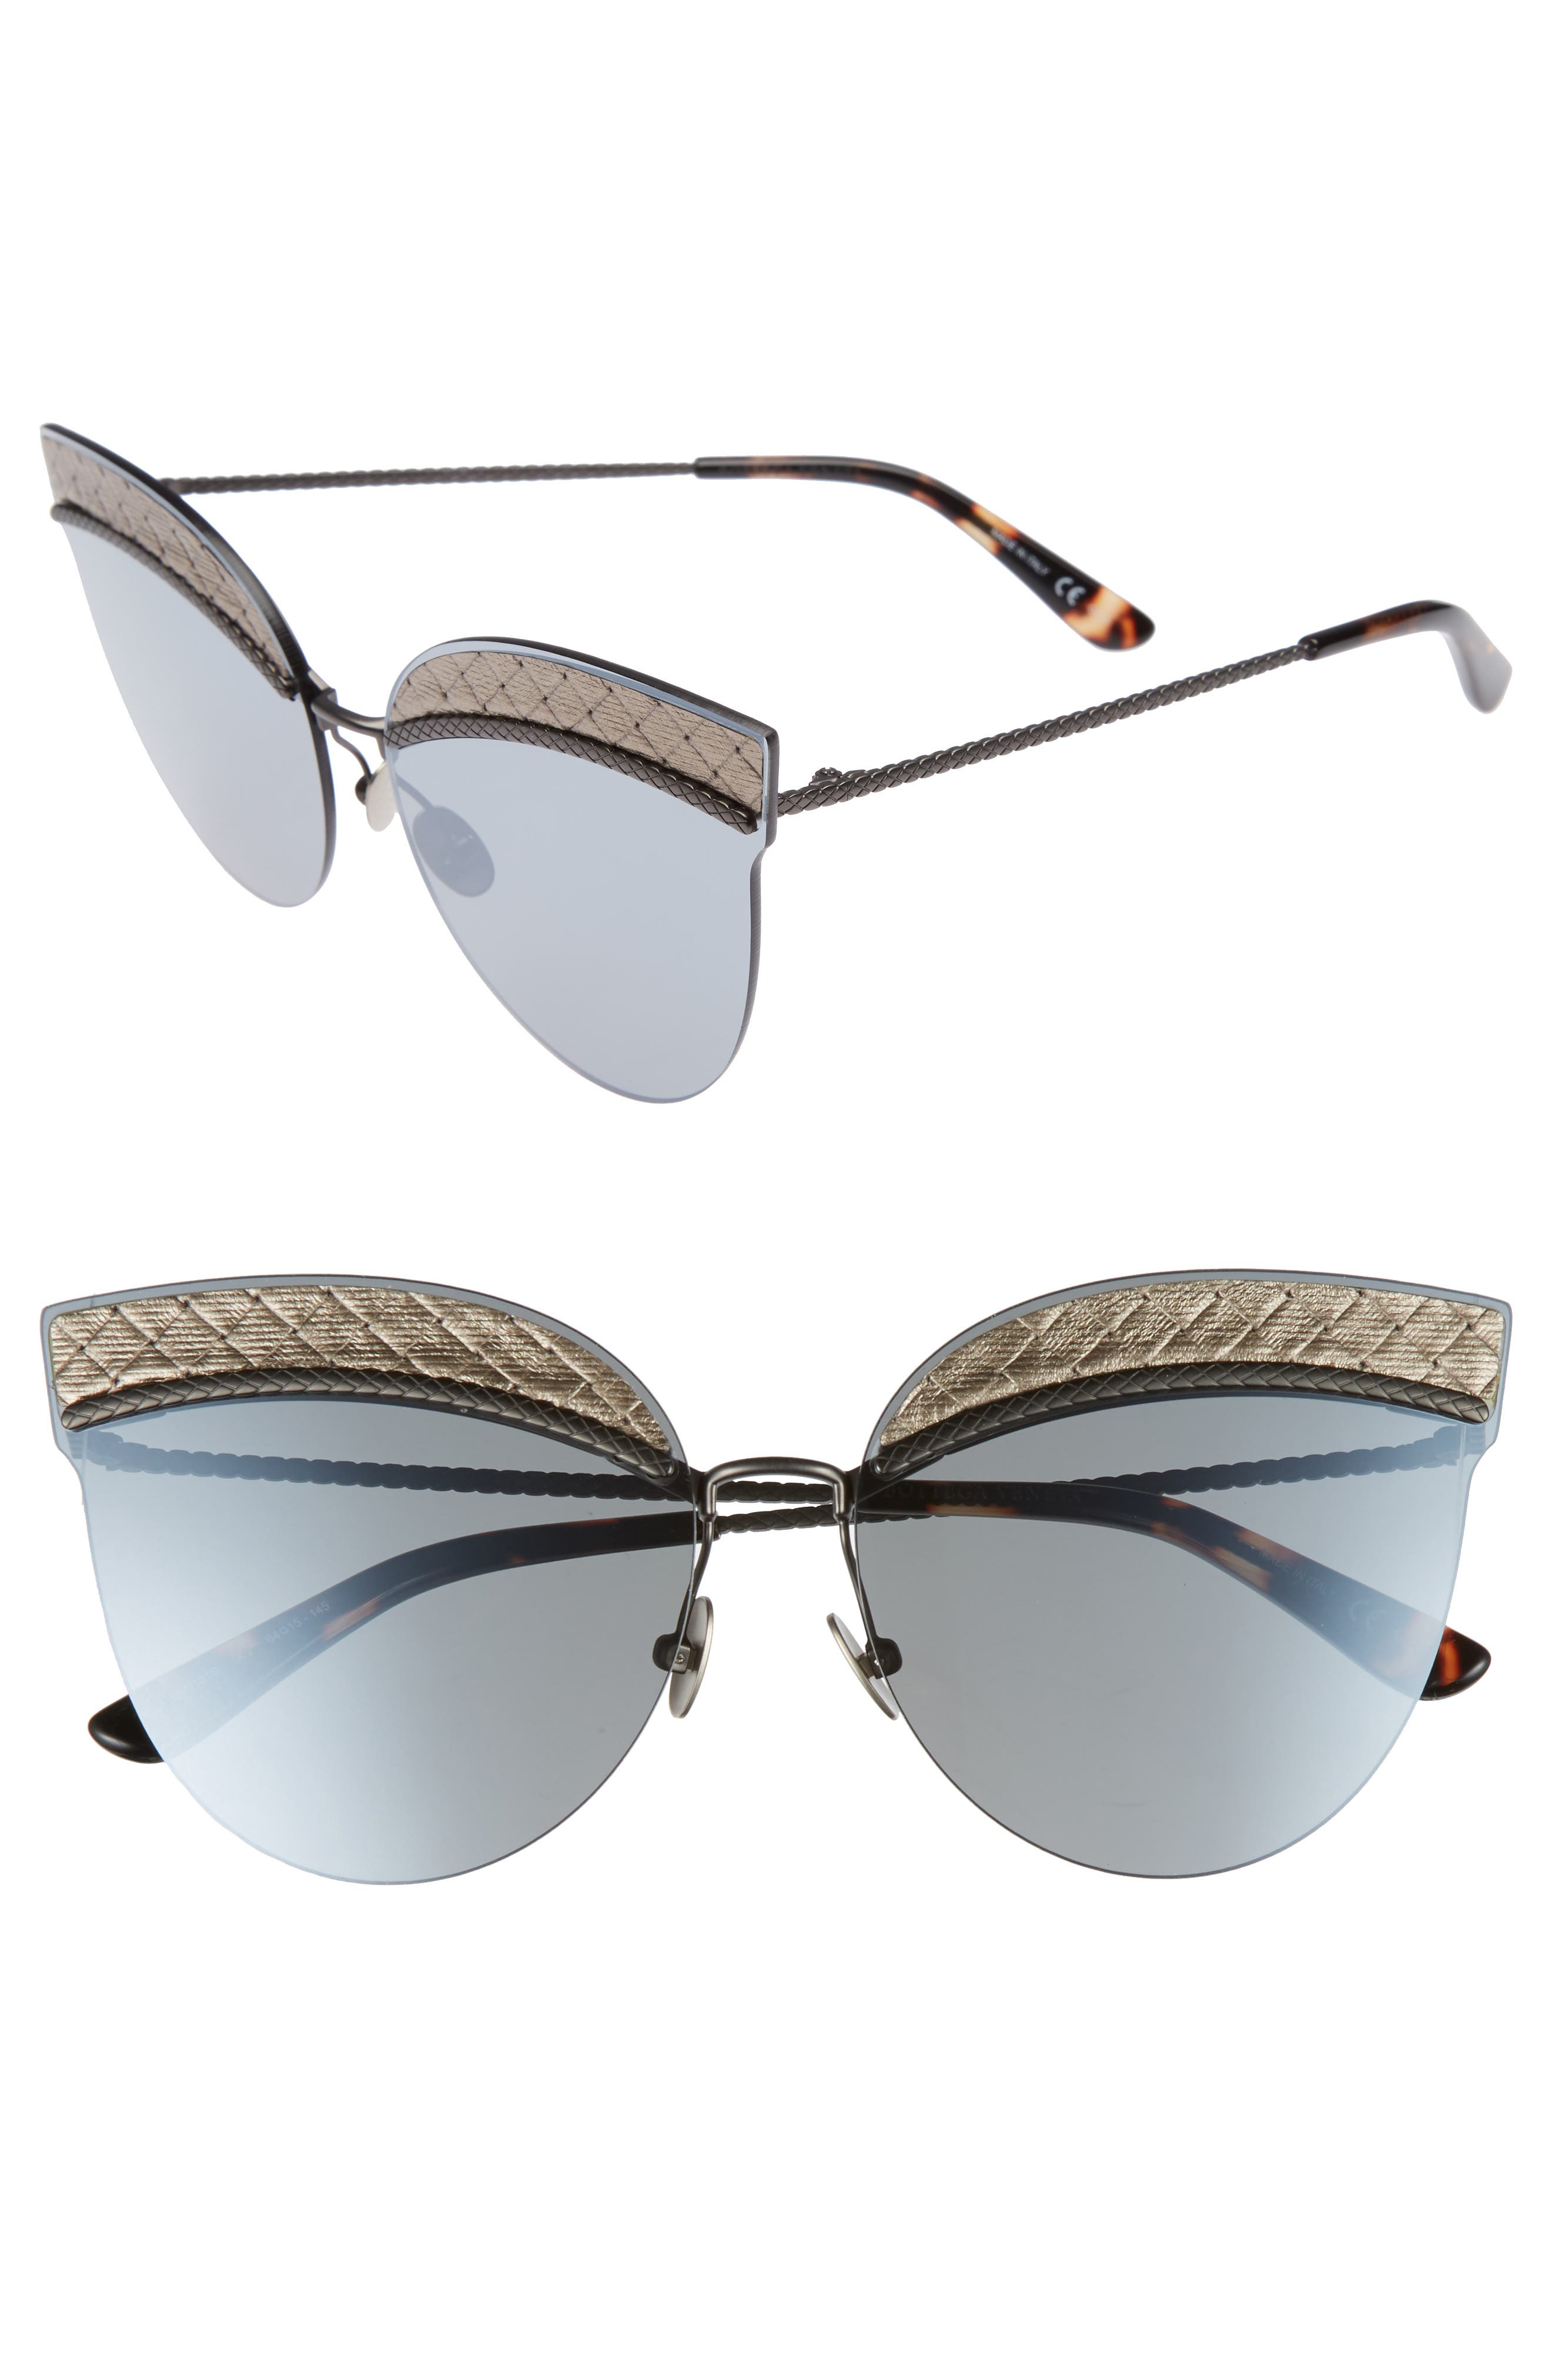 Main Image - Bottega Veneta 64mm Semi-Rimless Cat Eye Sunglasses